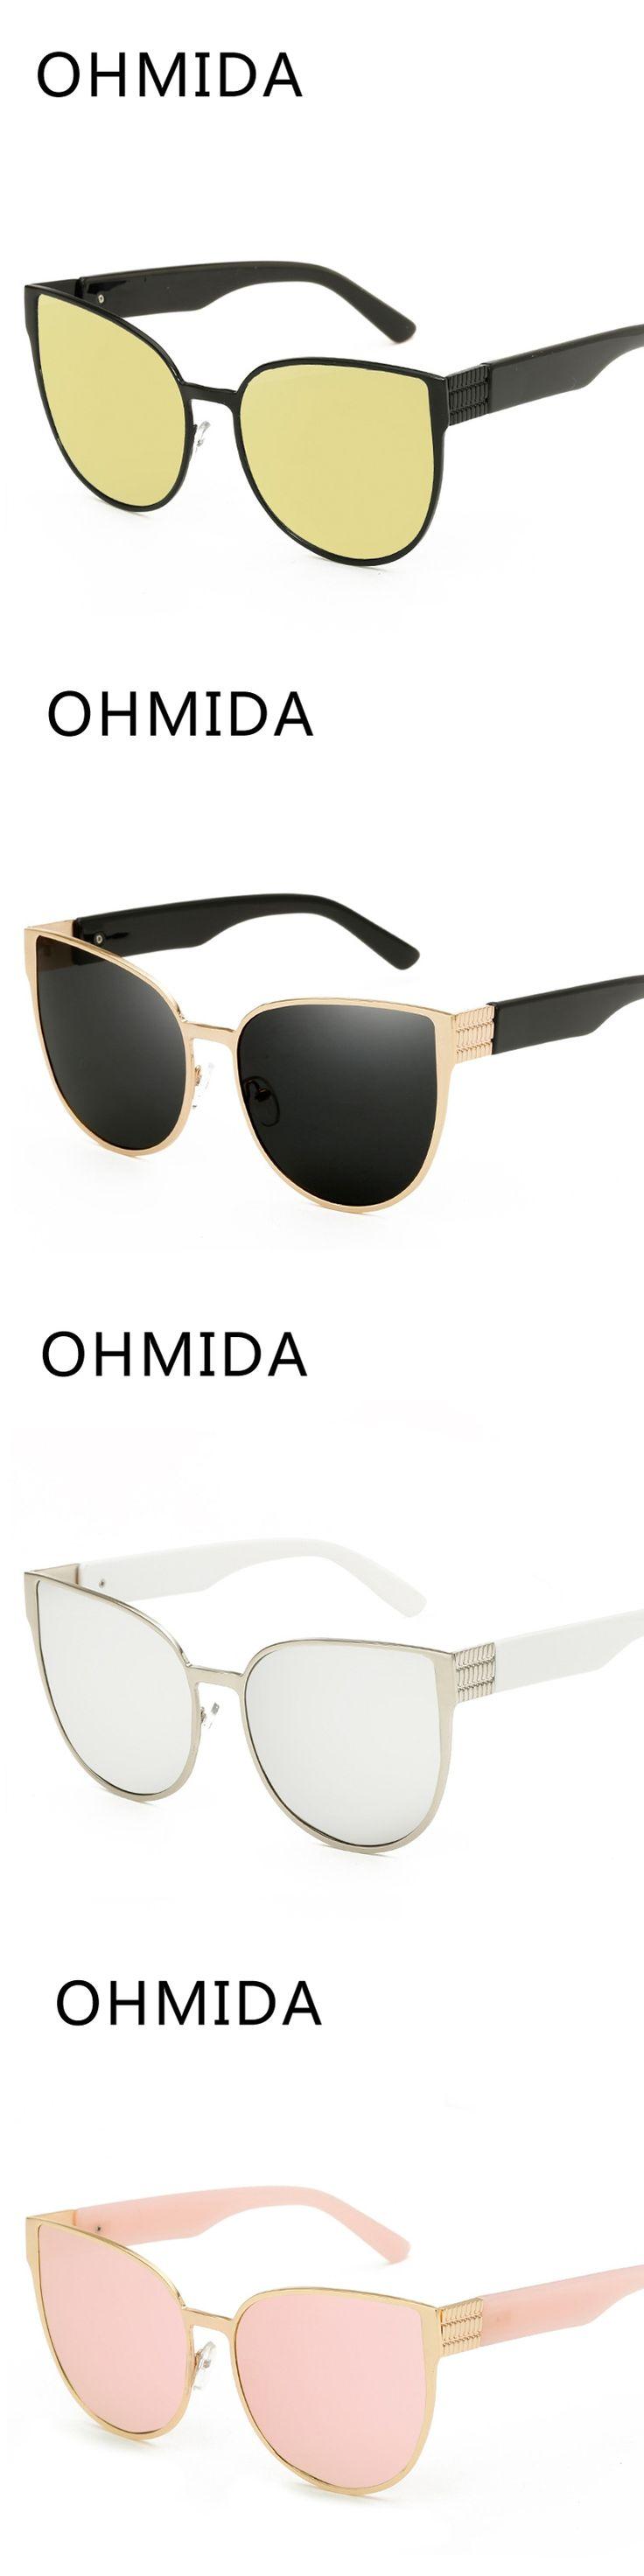 OHMIDA Hot Sale Pilot Sunglasses Men Sport Polarized Vintage Luxury Brand UV400 Glasses Women 2017 Eyewear gafas de sol mujer